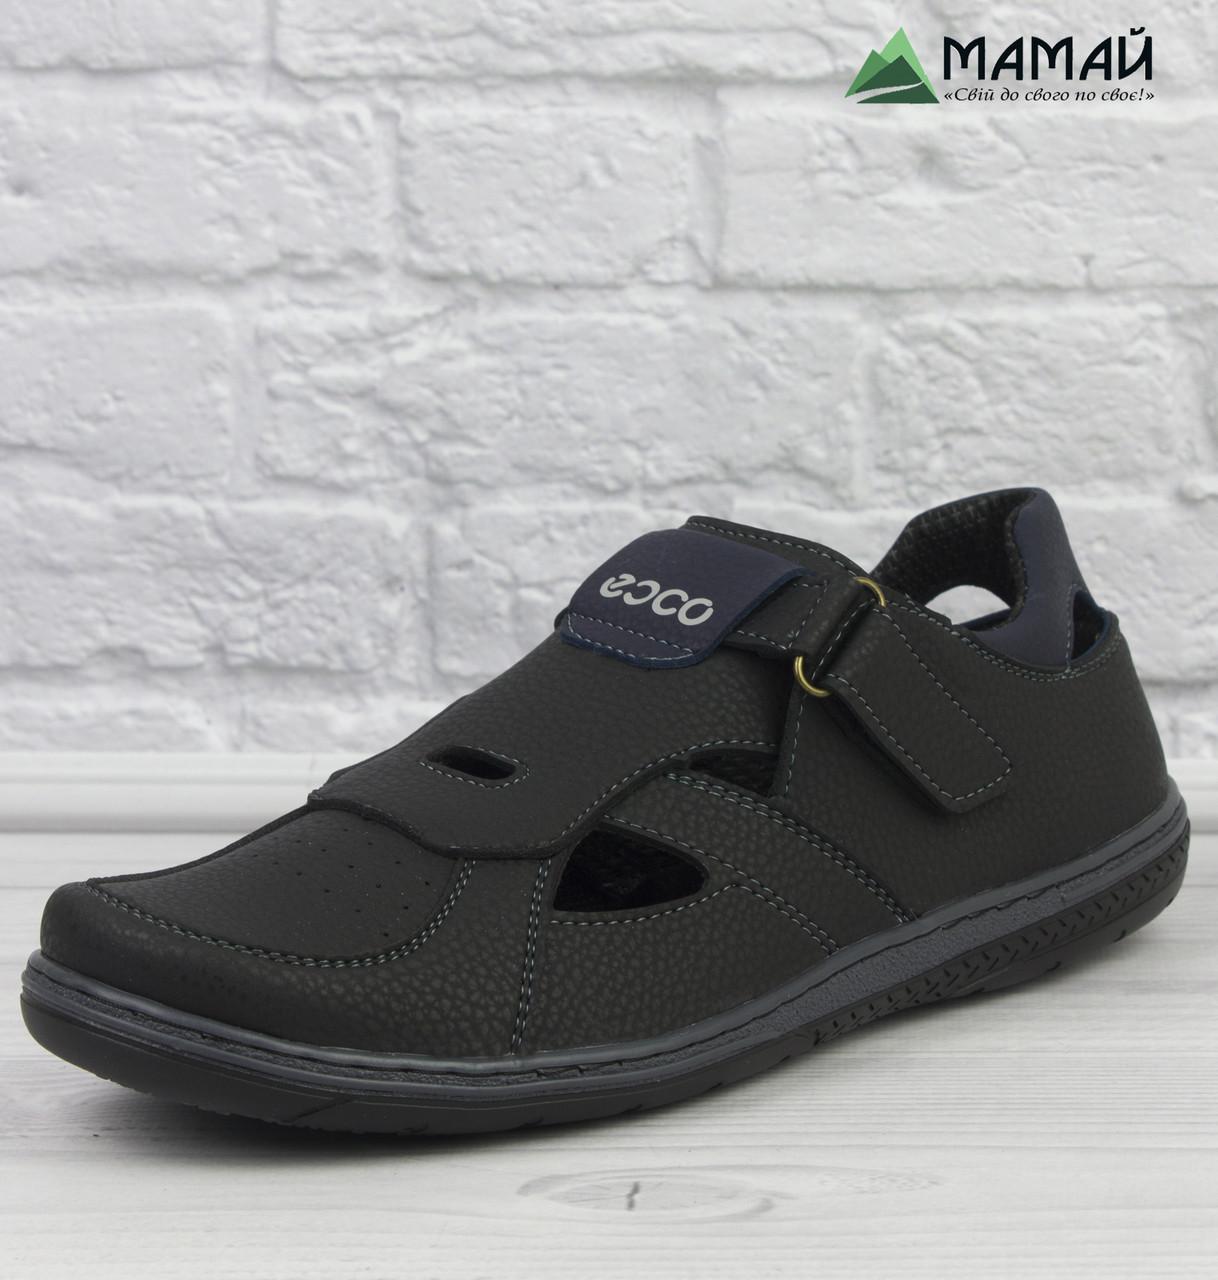 481bff4a4 Сандали мужские ECCO босоножки реплика - Інтернет-магазин дешевого взуття в  Львове